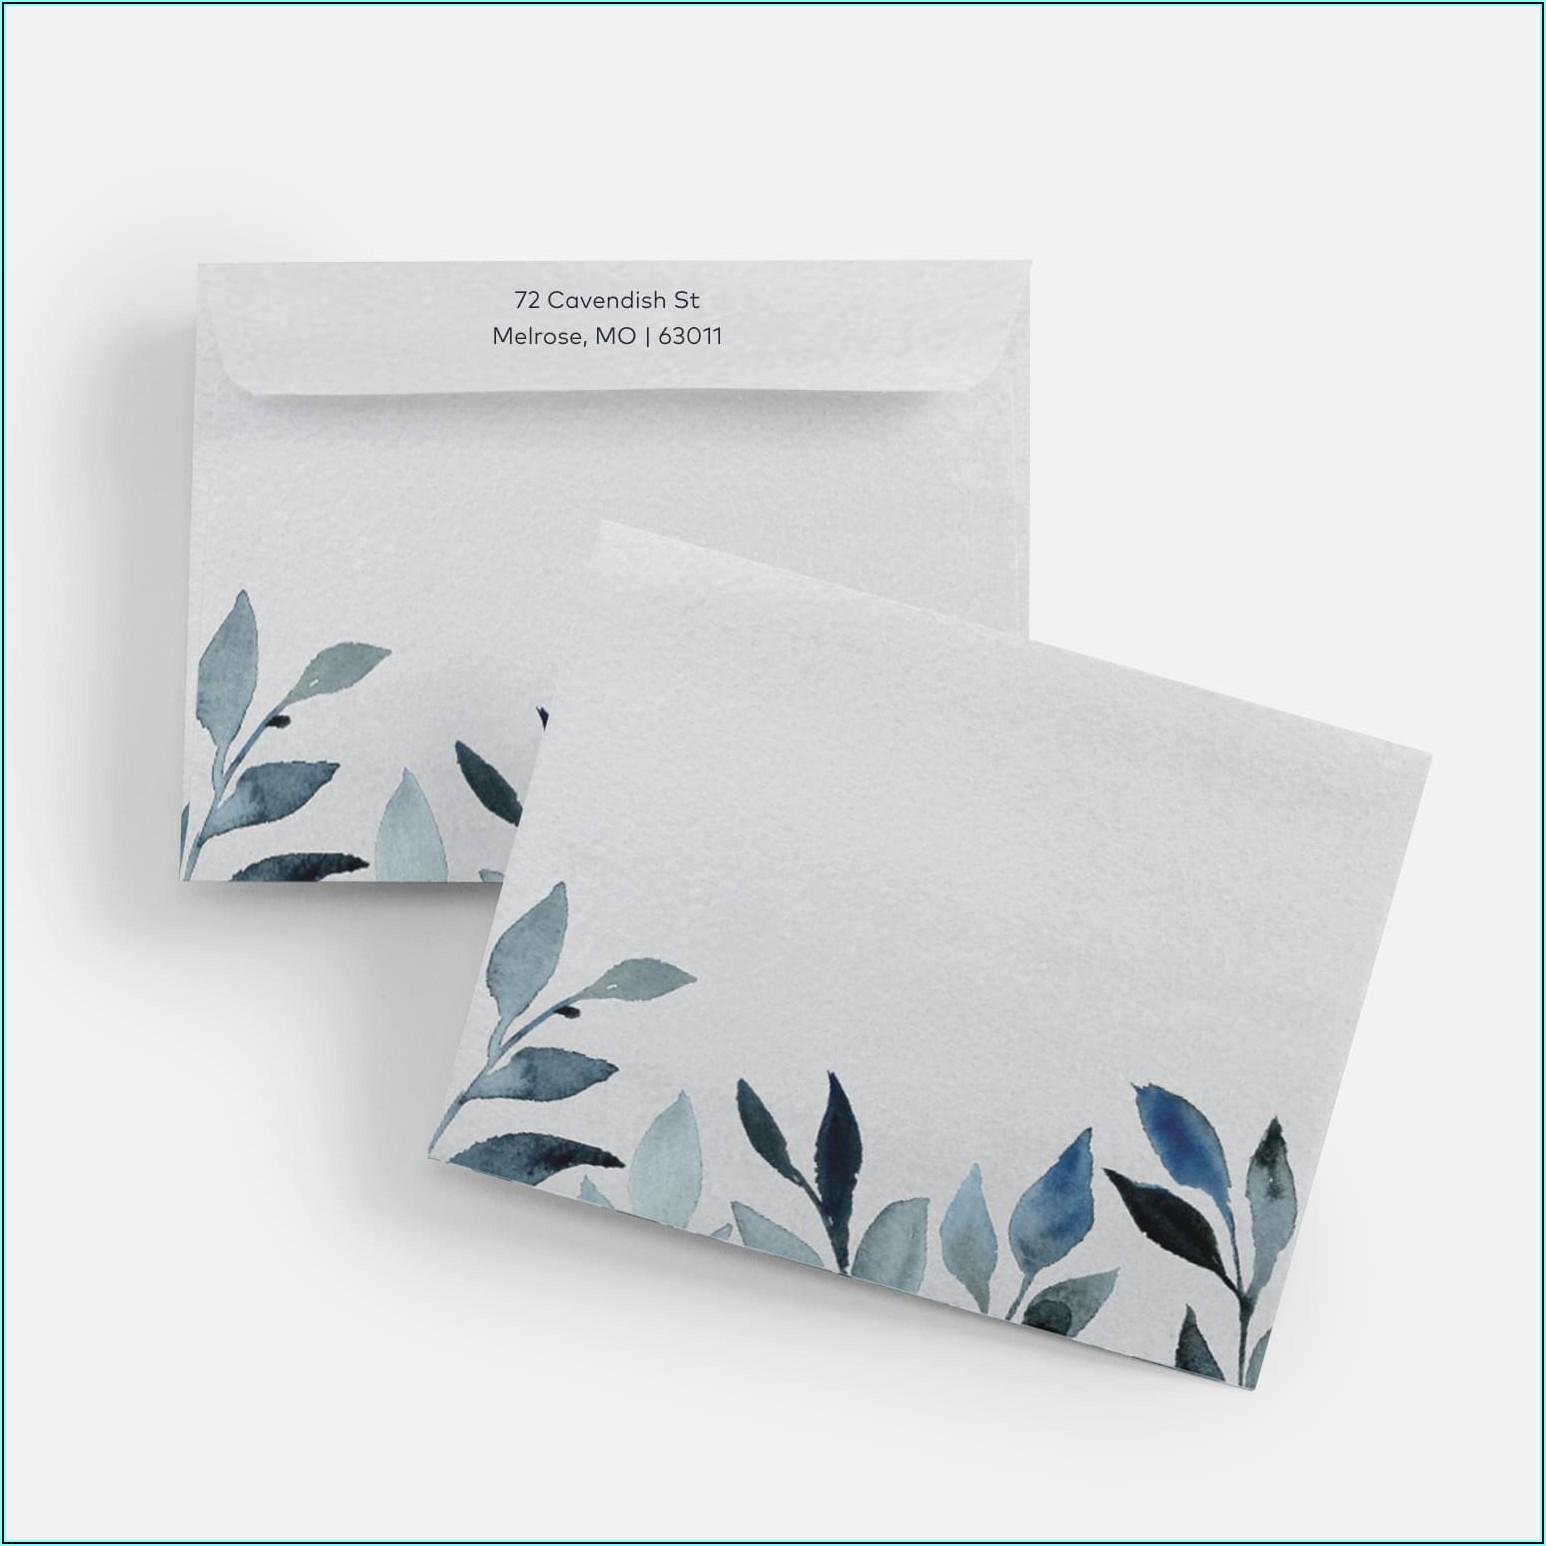 Custom Printed Peel And Seal Envelopes